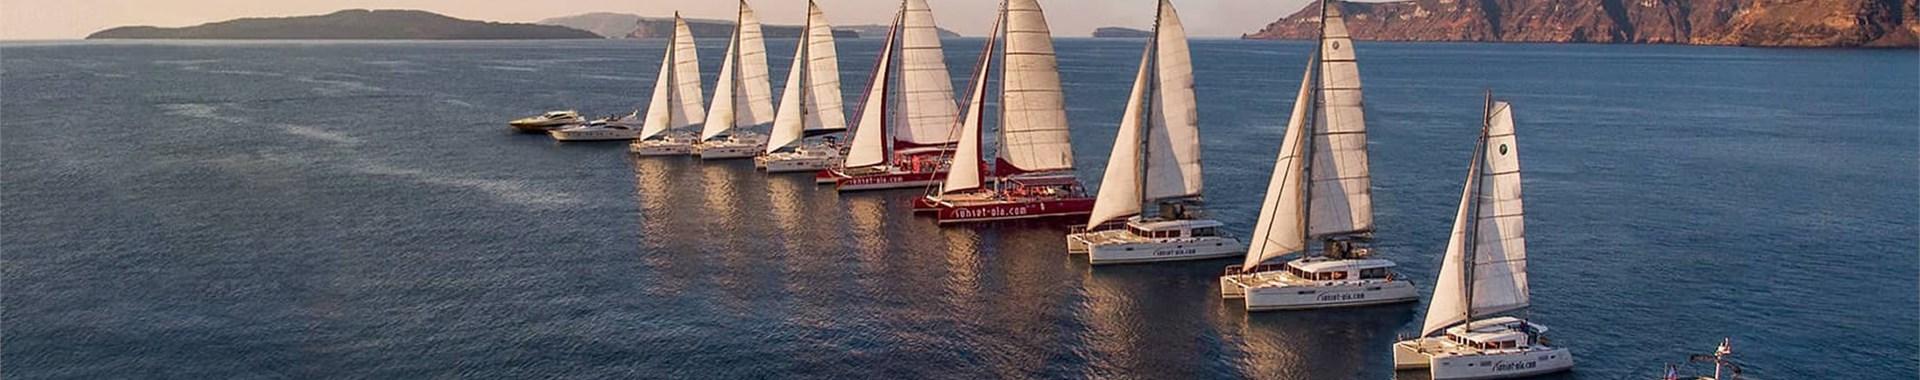 Sunset Oia Sailing Cruises